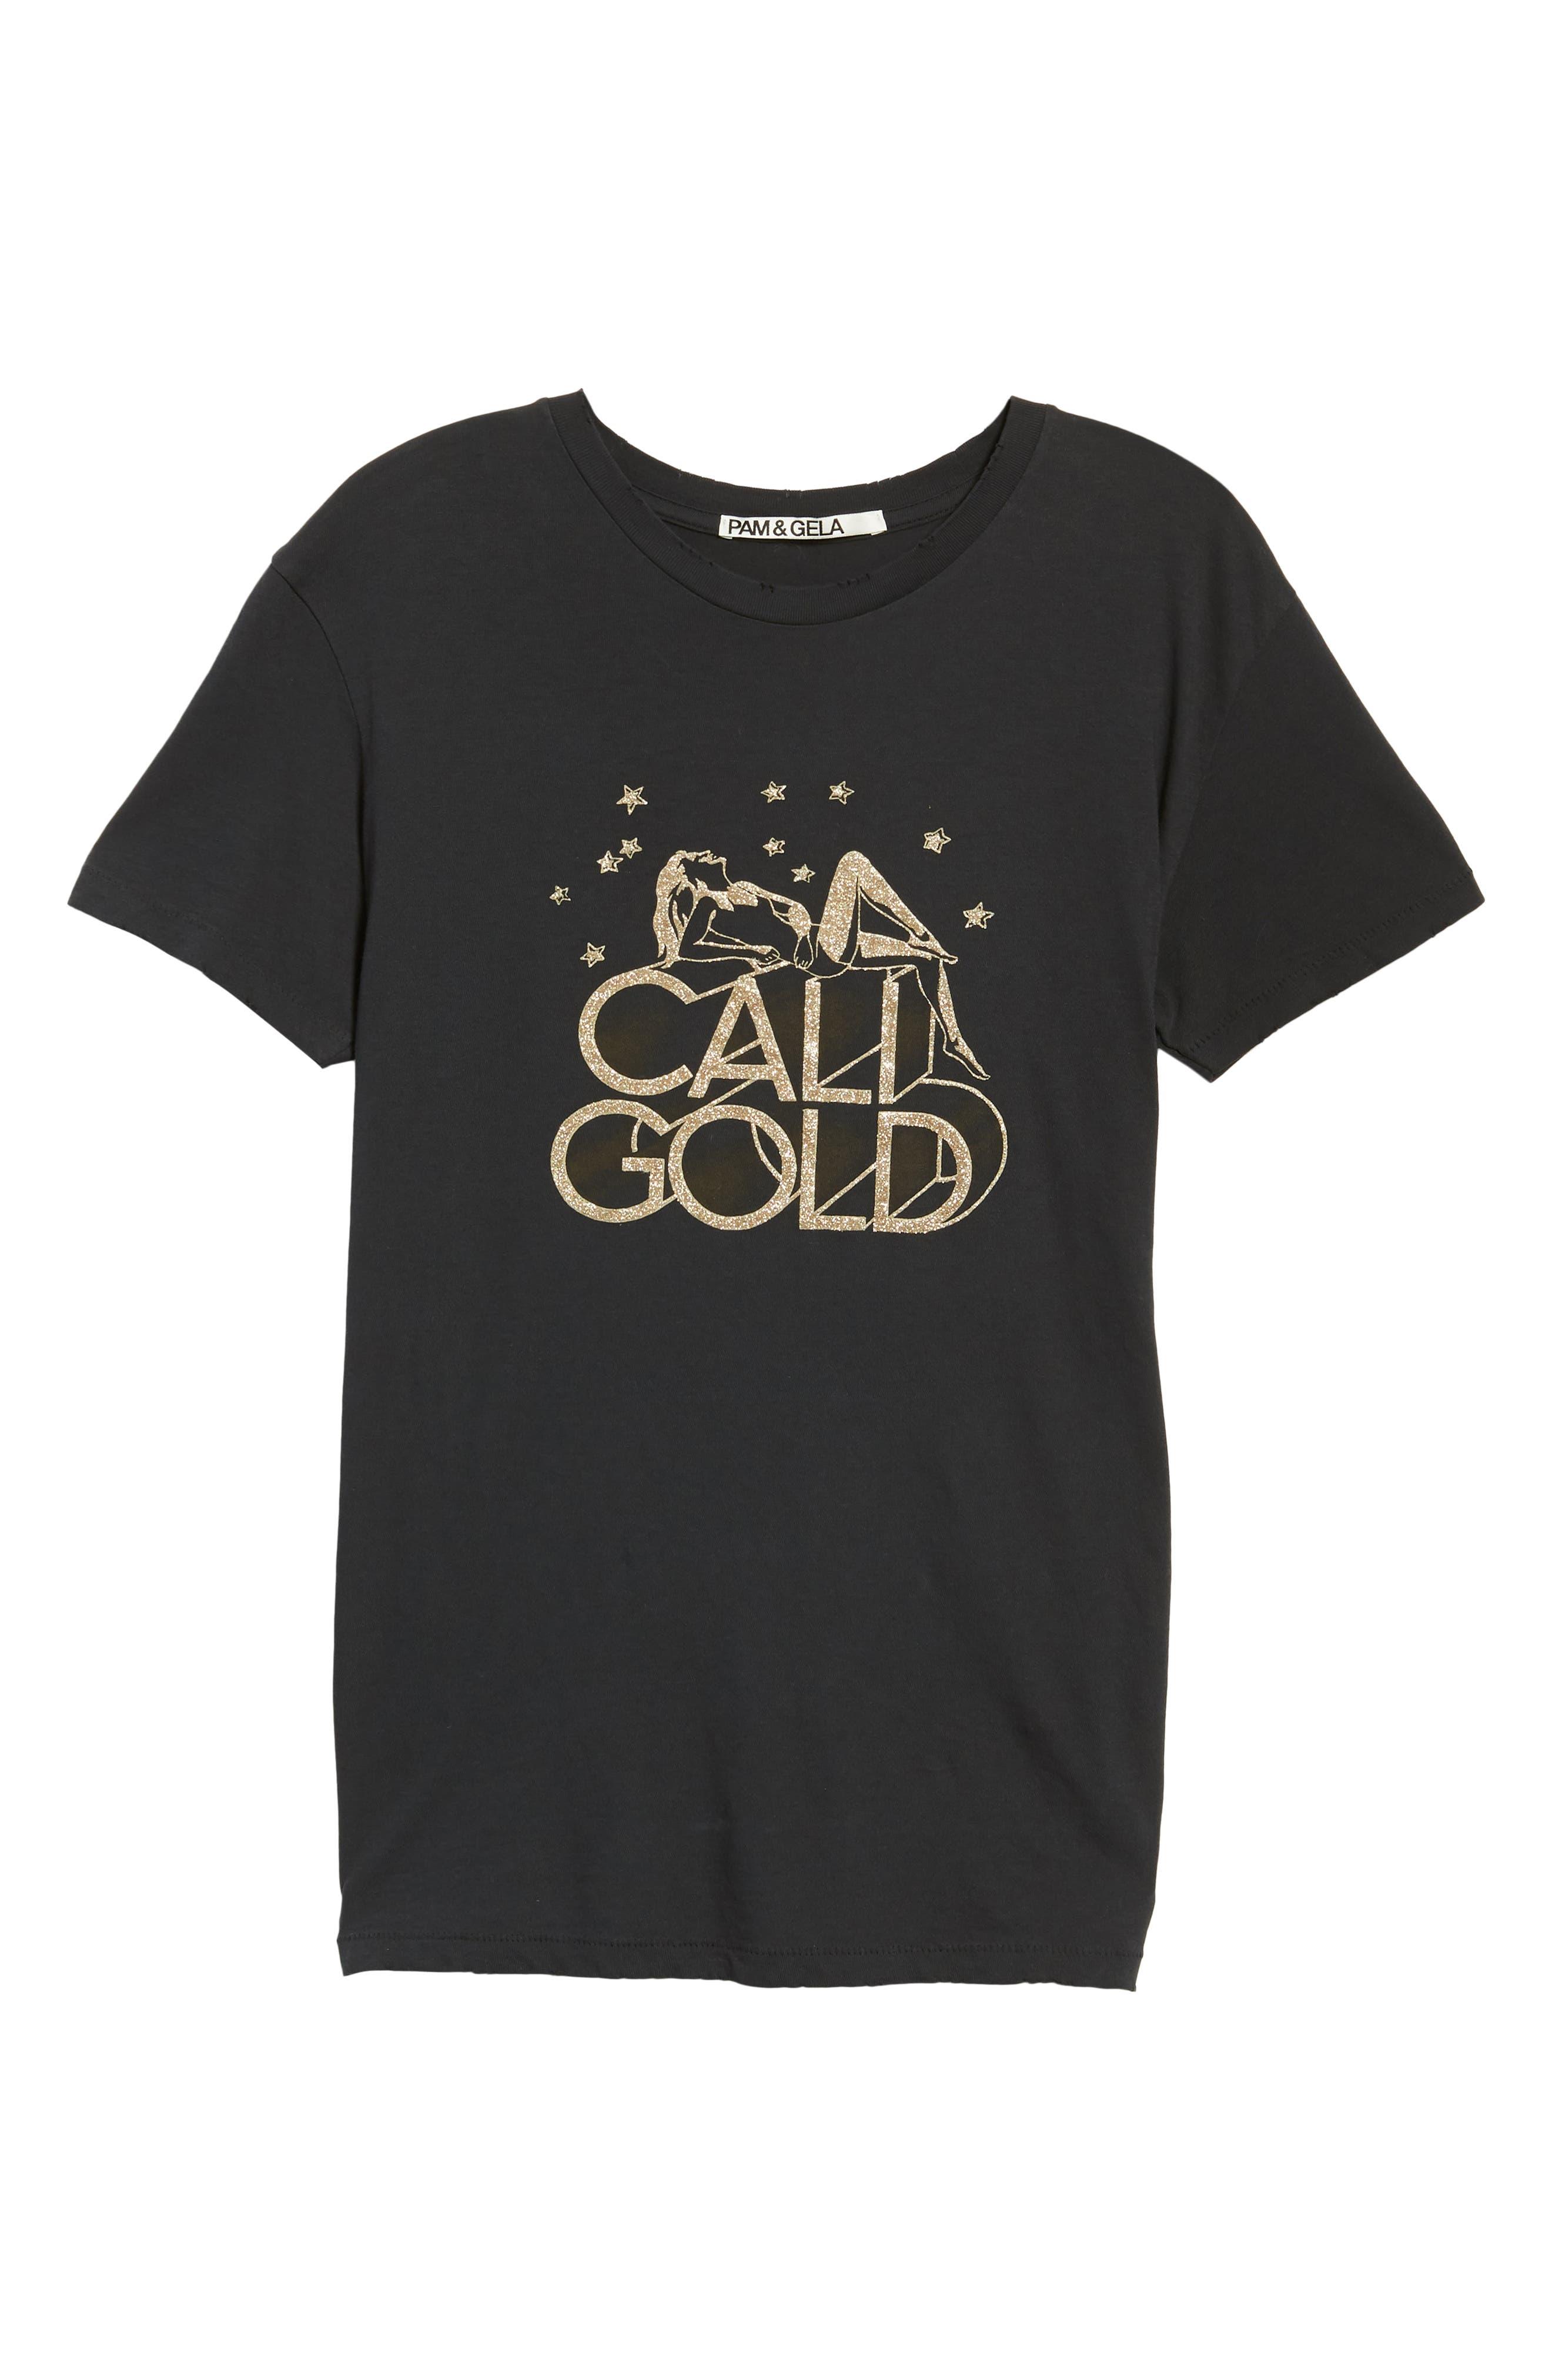 Cali Gold Tee,                             Alternate thumbnail 6, color,                             FADED BLACK